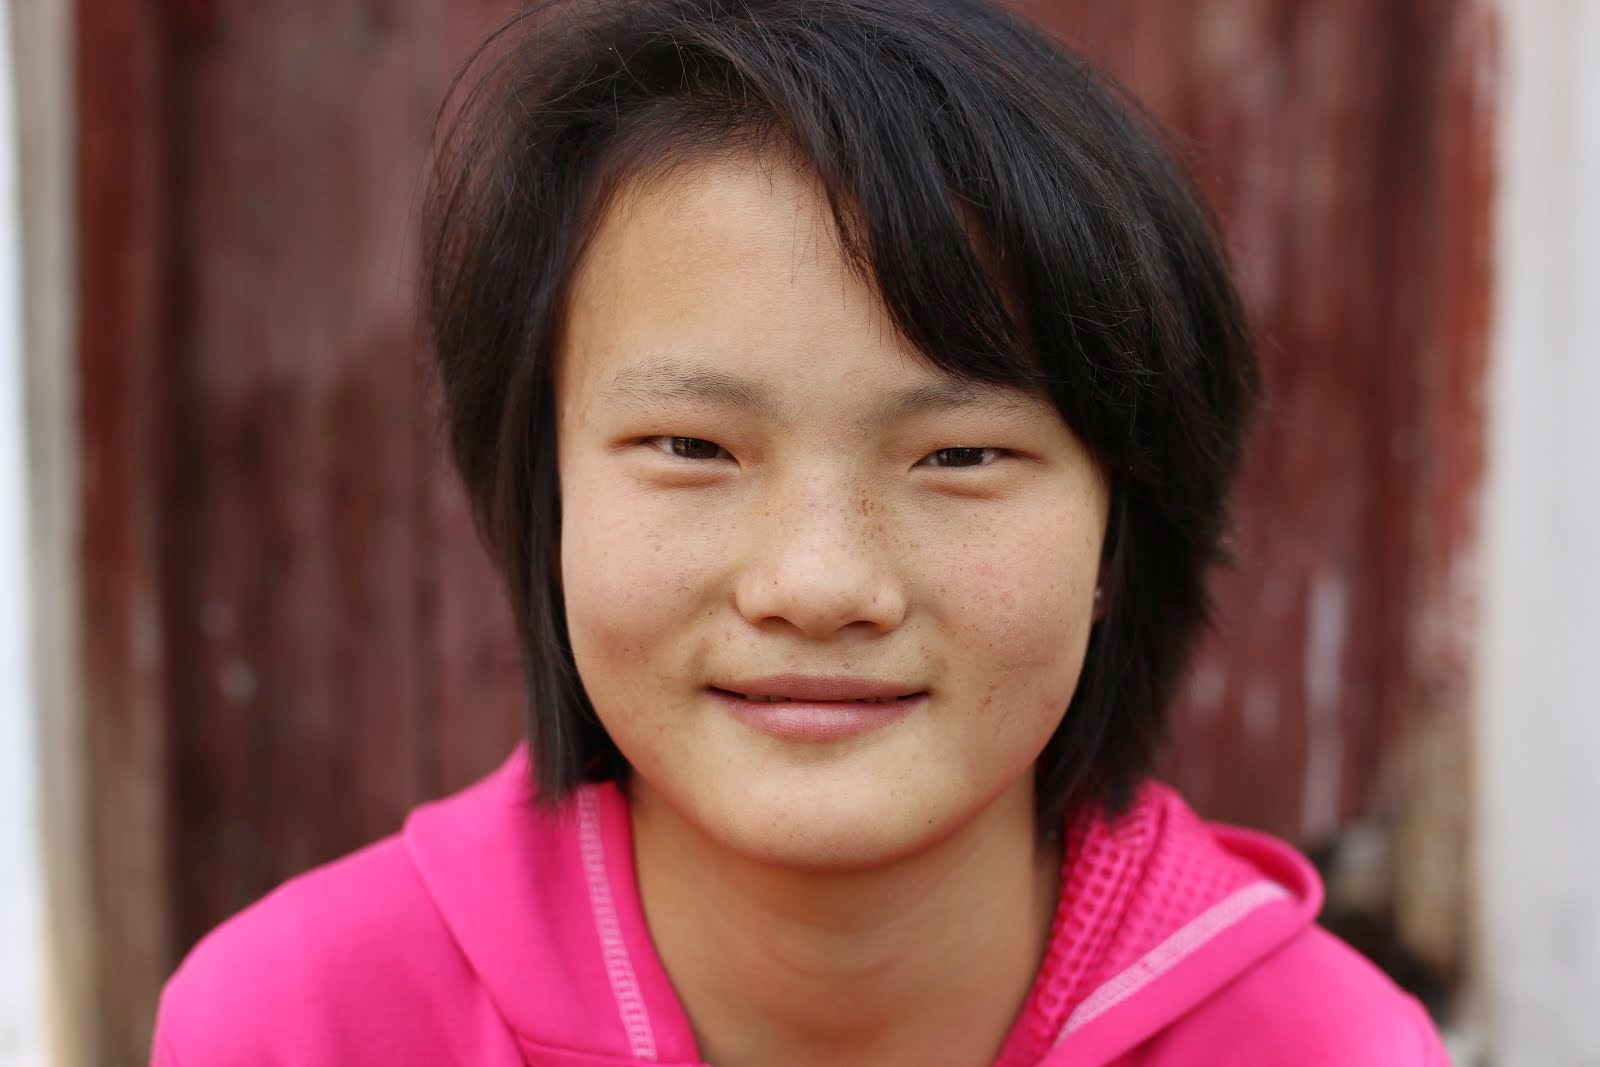 Avery, age 14